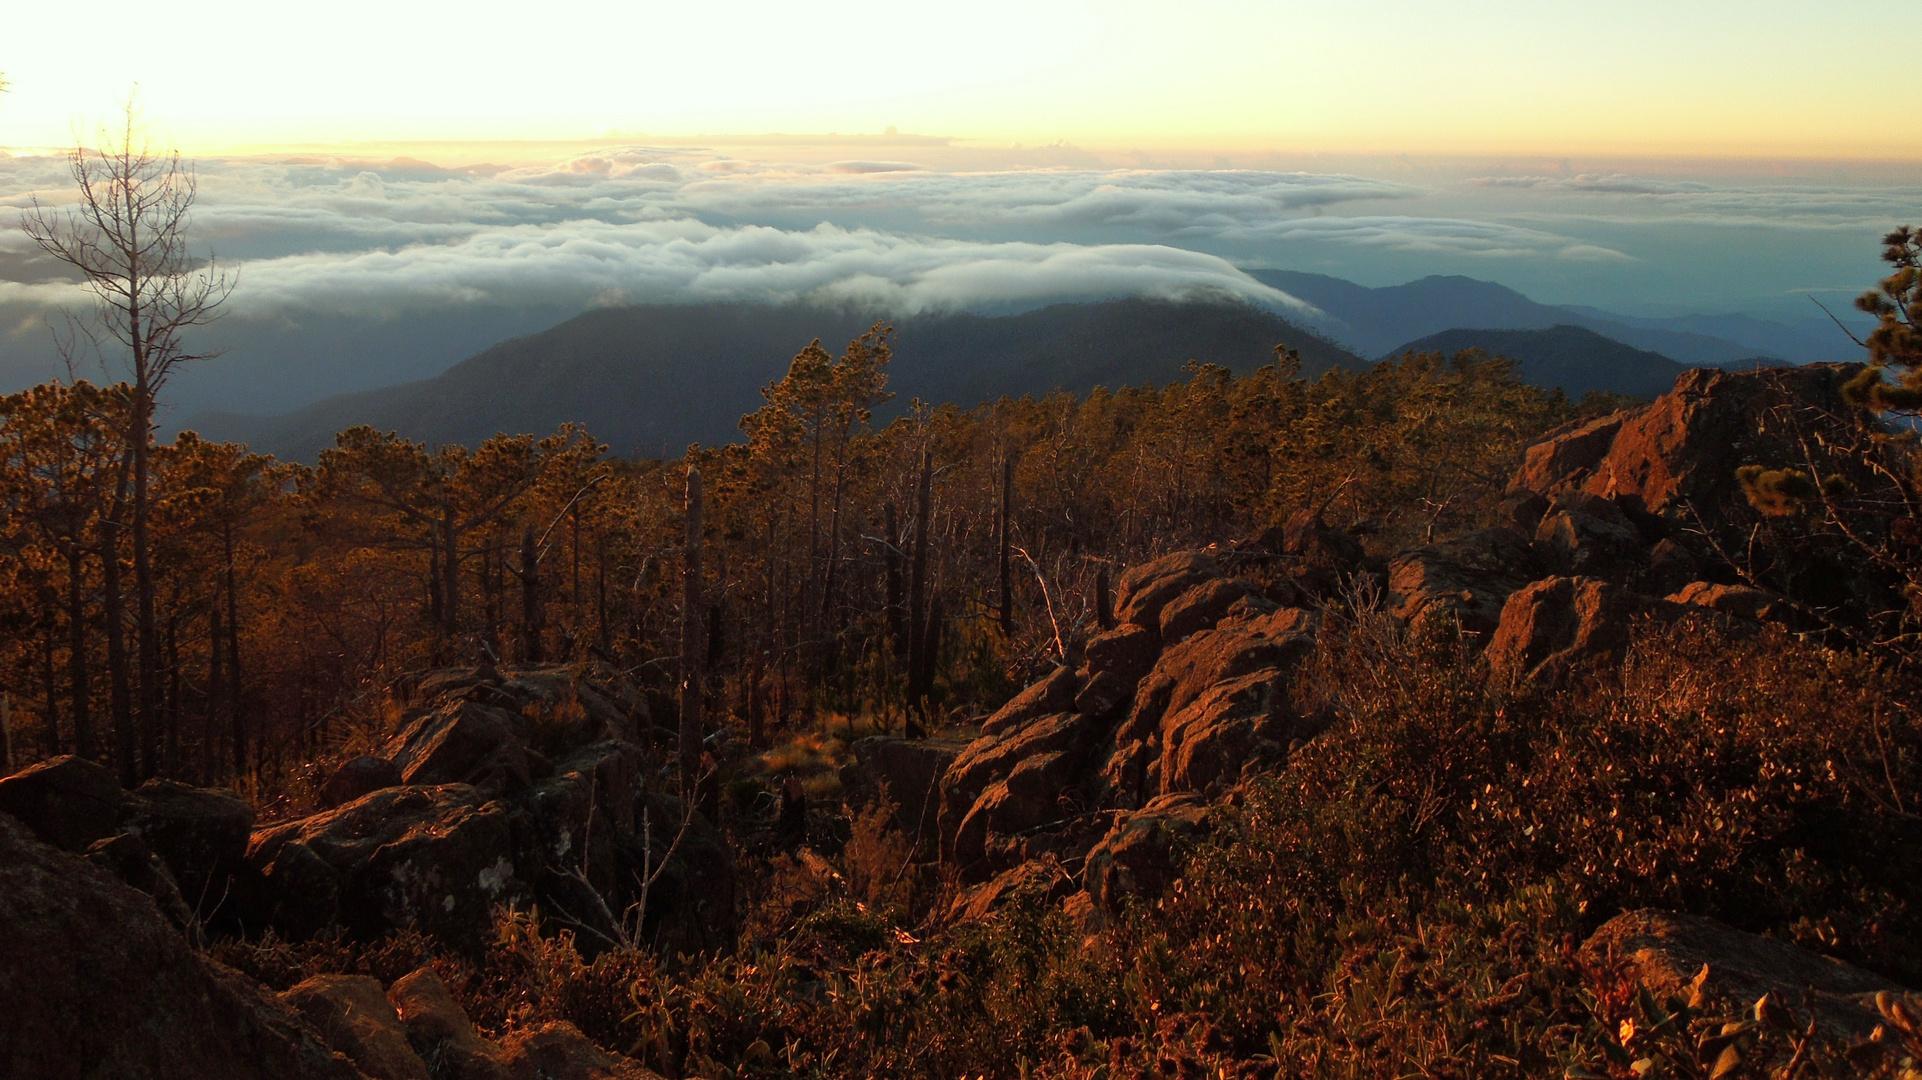 Blick vom Pico Duarte am Morgen